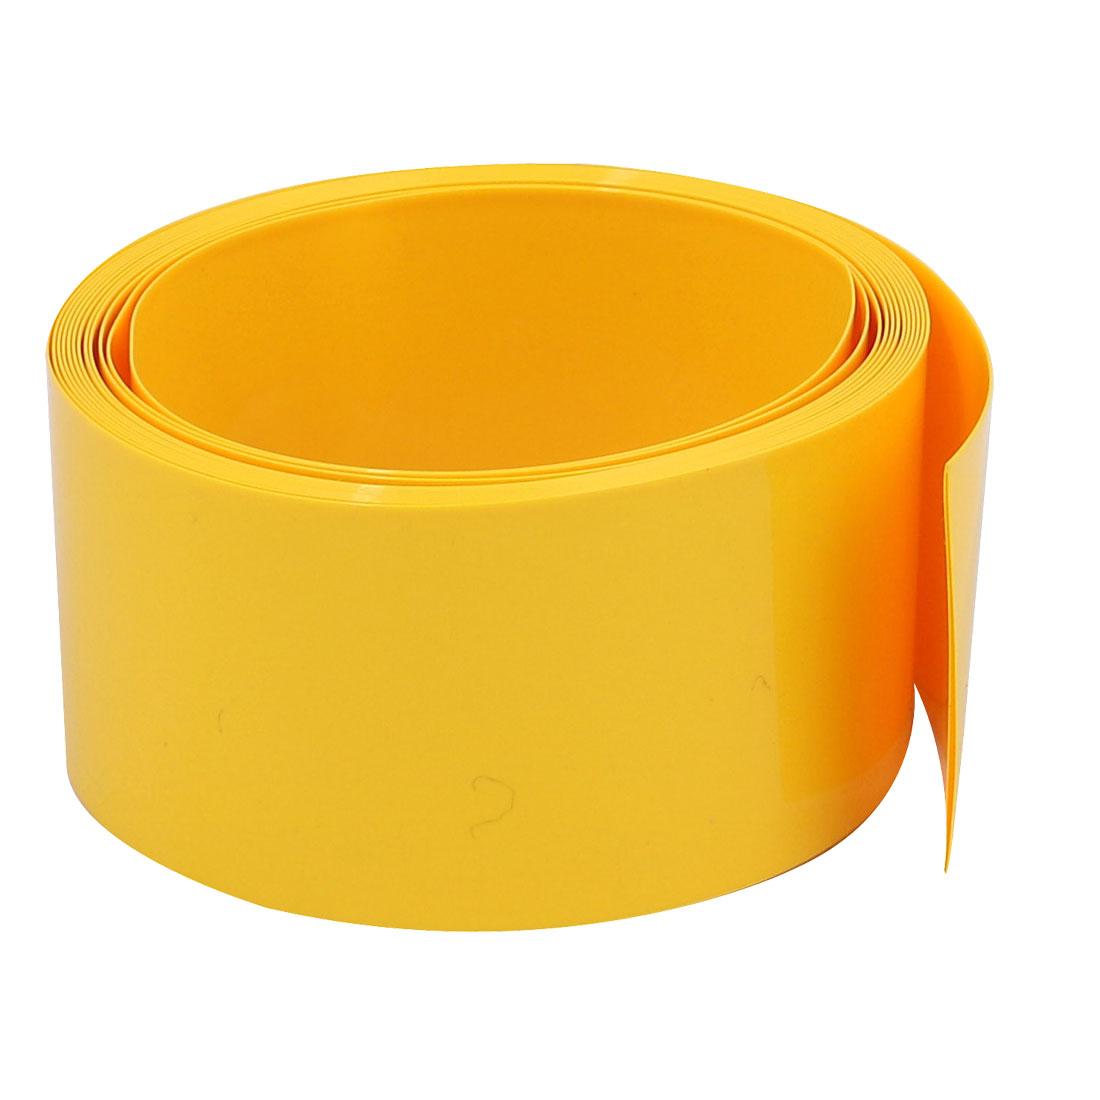 29.5mm Flat Width 2M Long PVC Heat Shrinkable Tube Yellow for 18650 Battery Pack